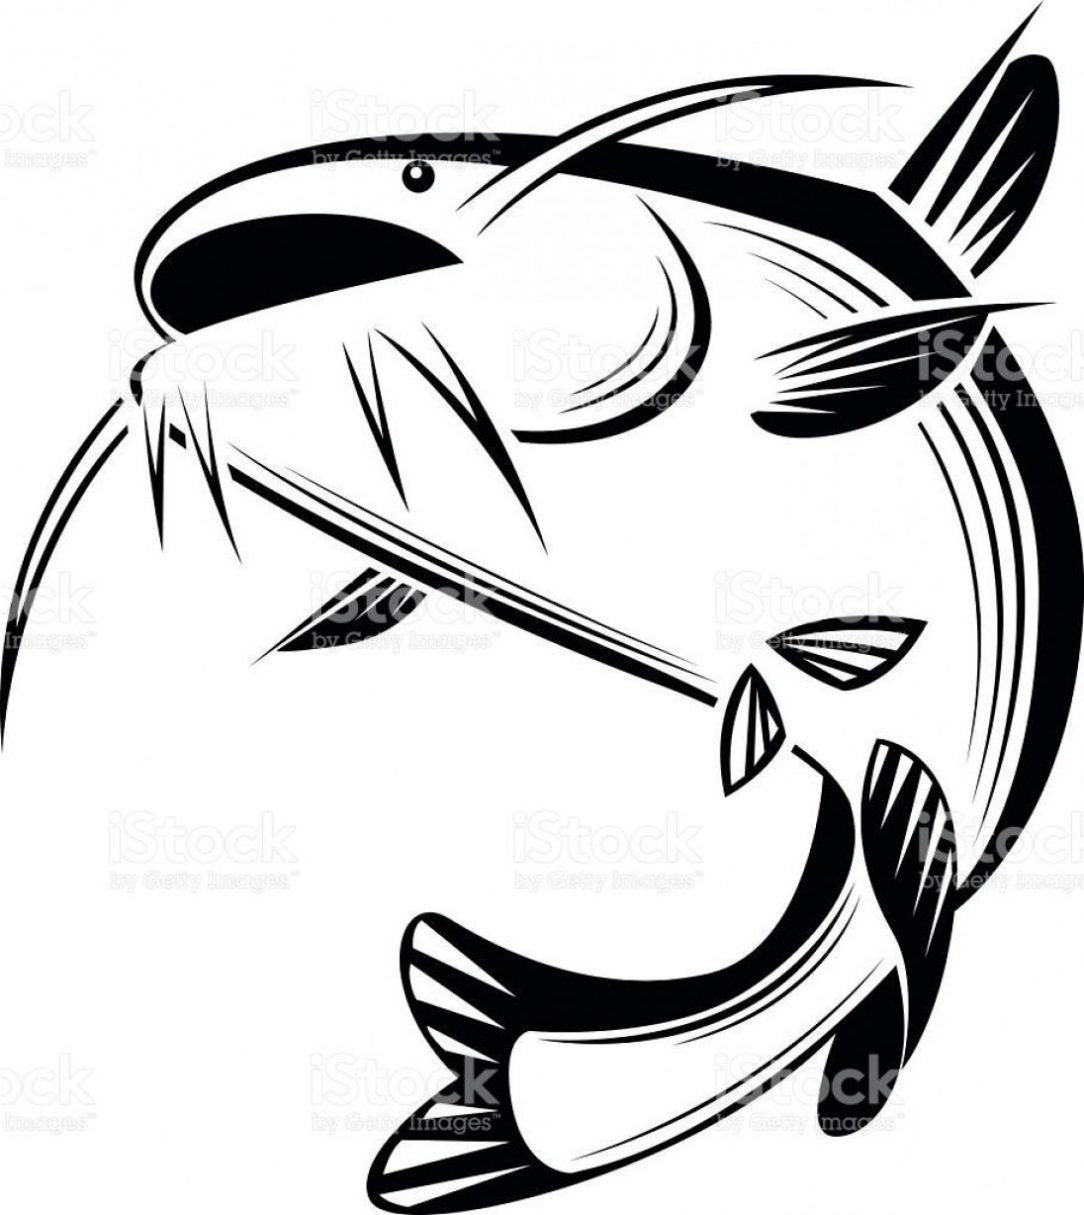 1084x1215 Chinese Catfish Drawing Skeleton Cute Cool Flathead